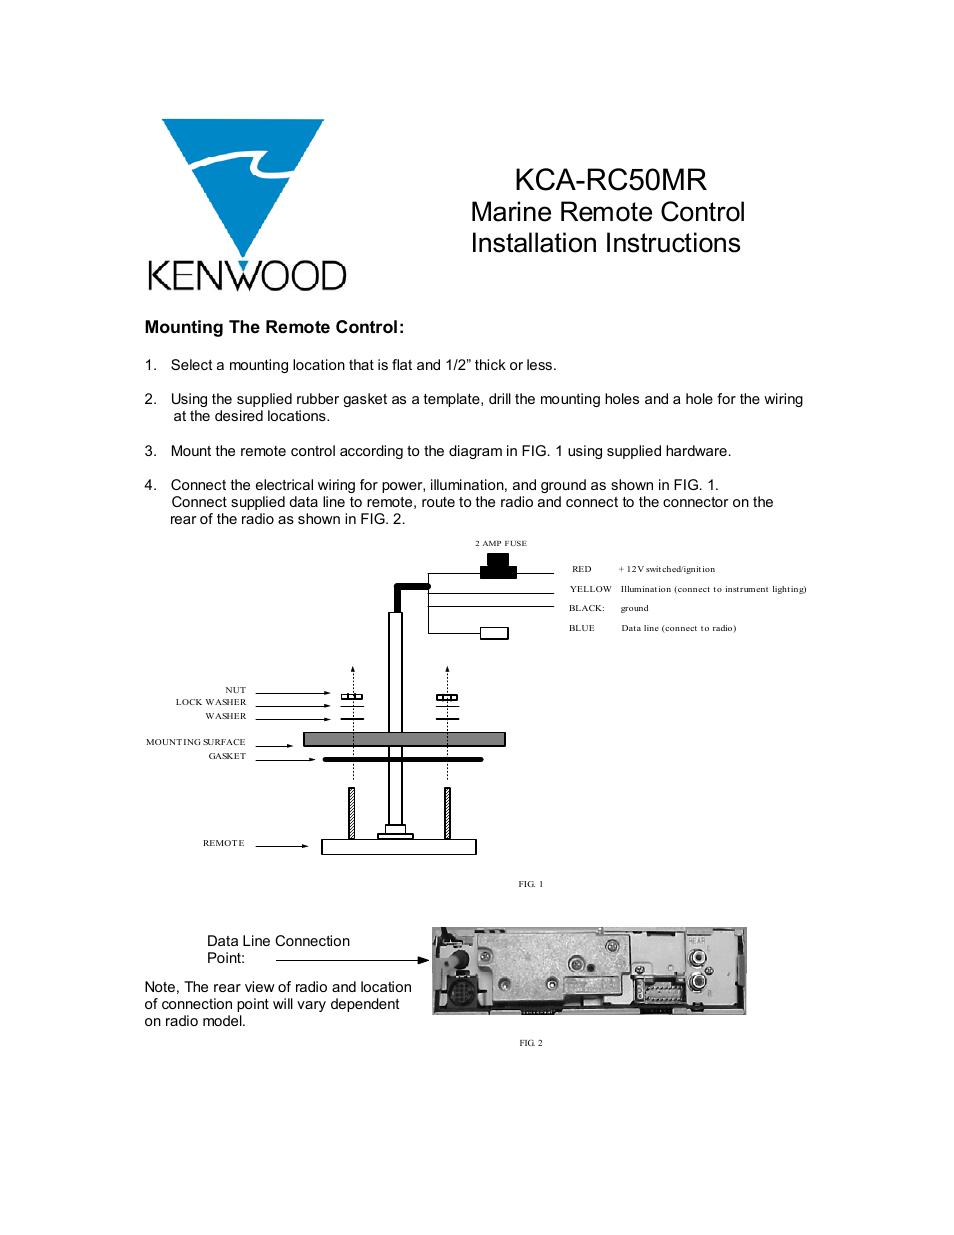 Kenwood Marine Remote Control Kca